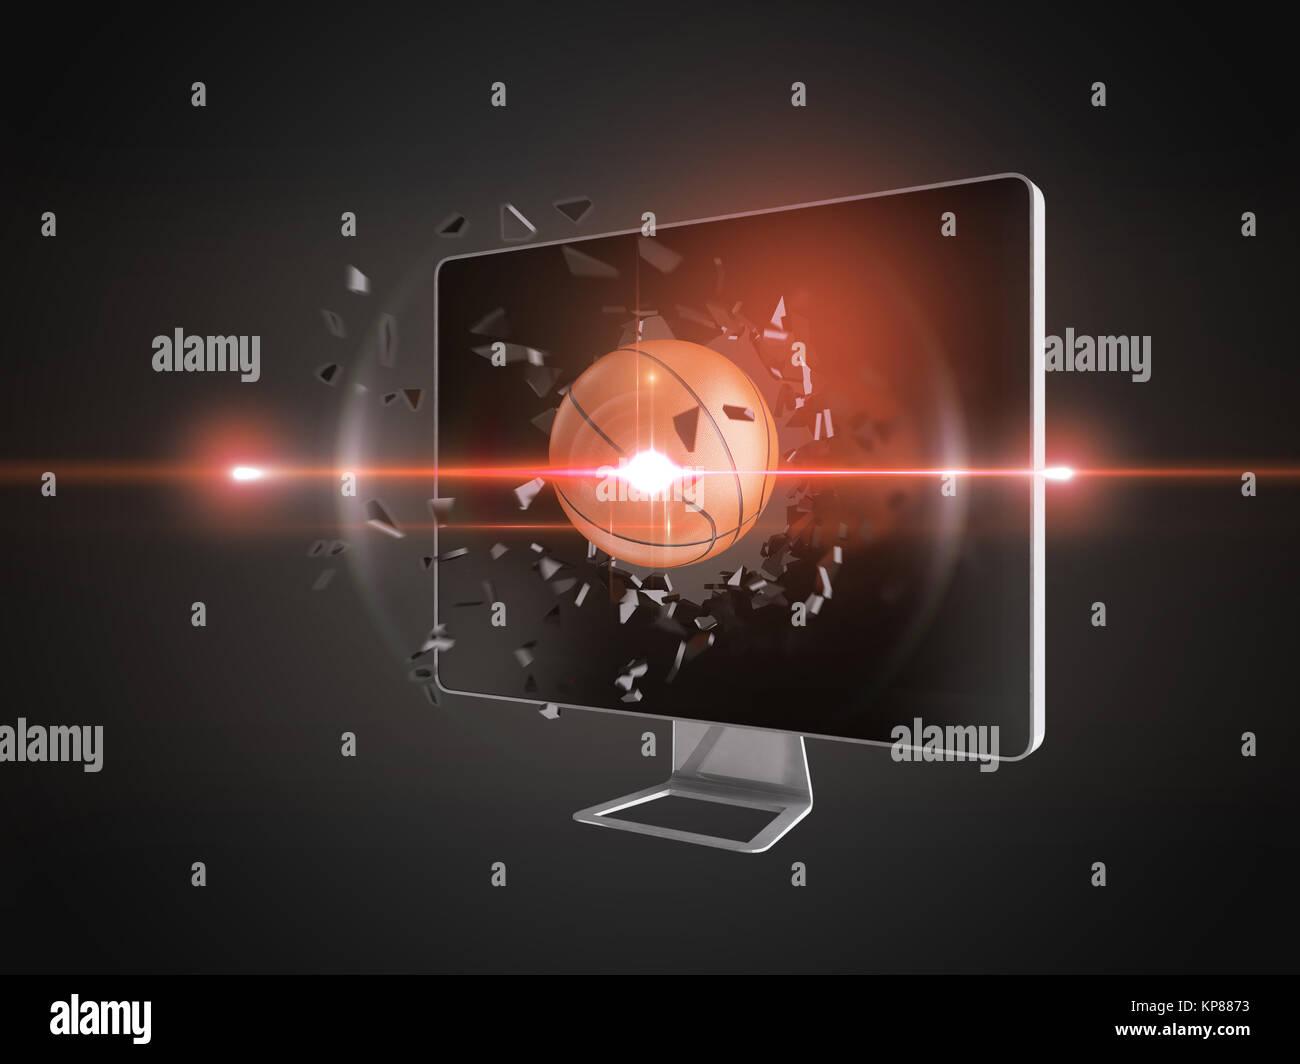 basketball destroy computer screen. - Stock Image